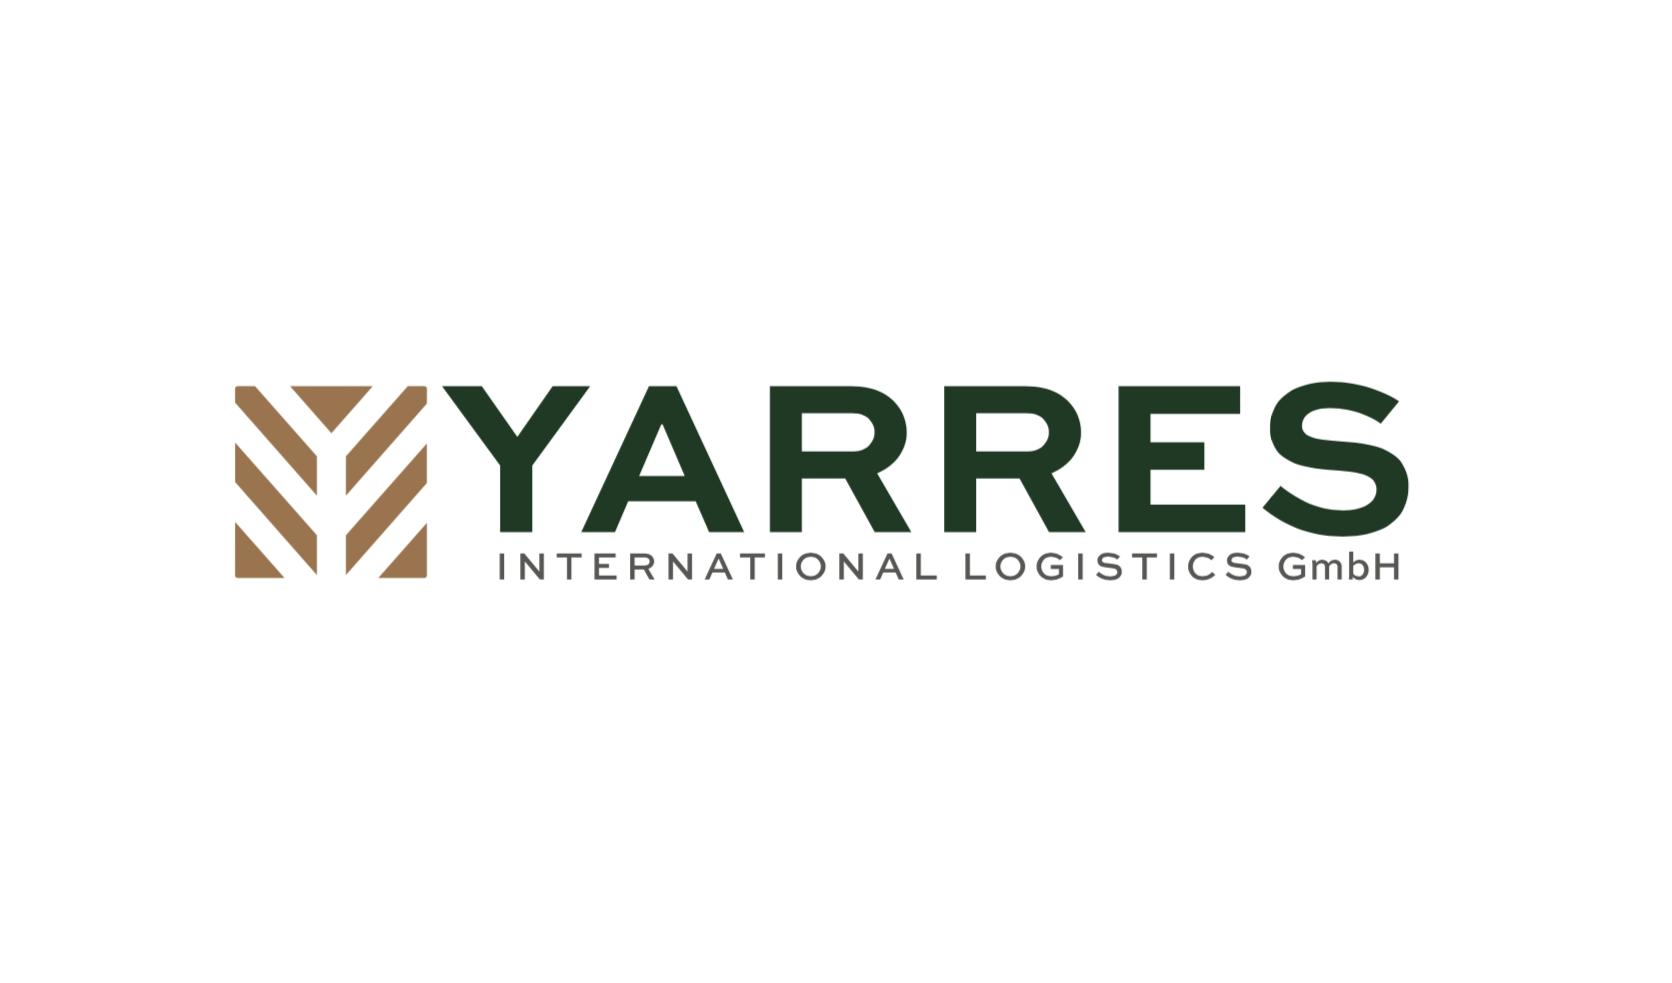 Yarres International Logistics GmbH